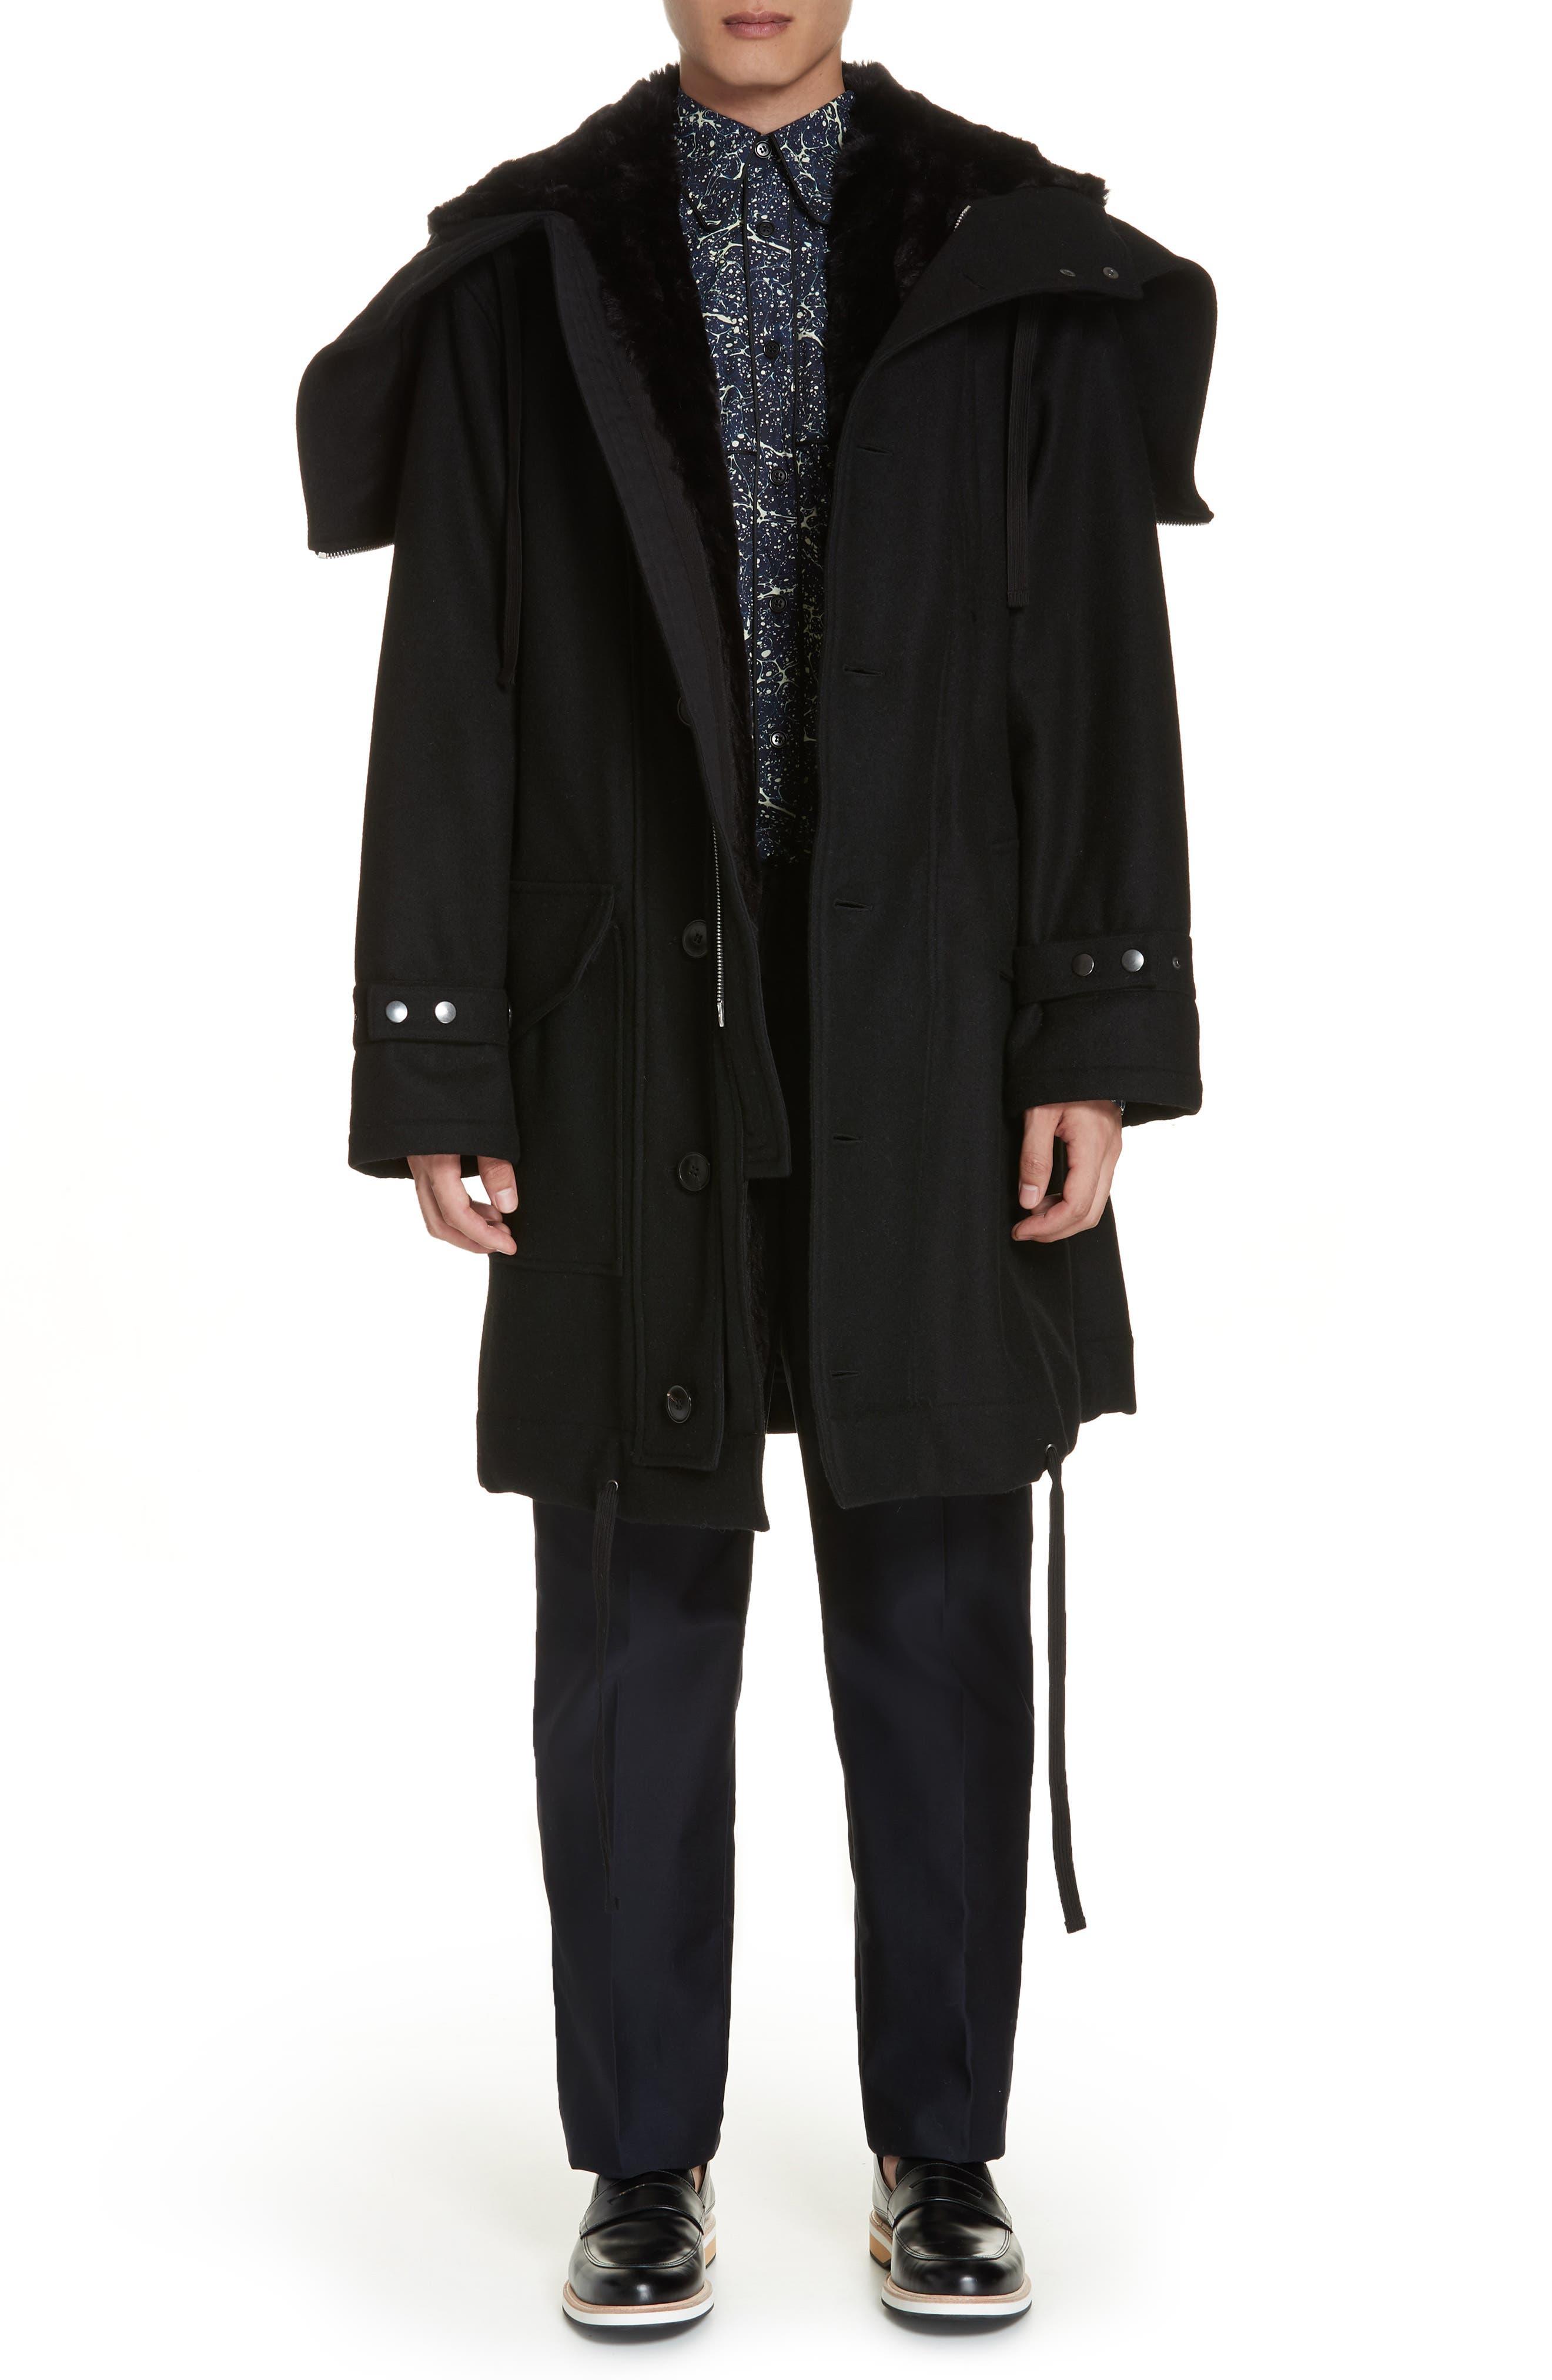 Verreli Hooded Parka with Faux Fur Trim,                             Main thumbnail 1, color,                             BLACK 900